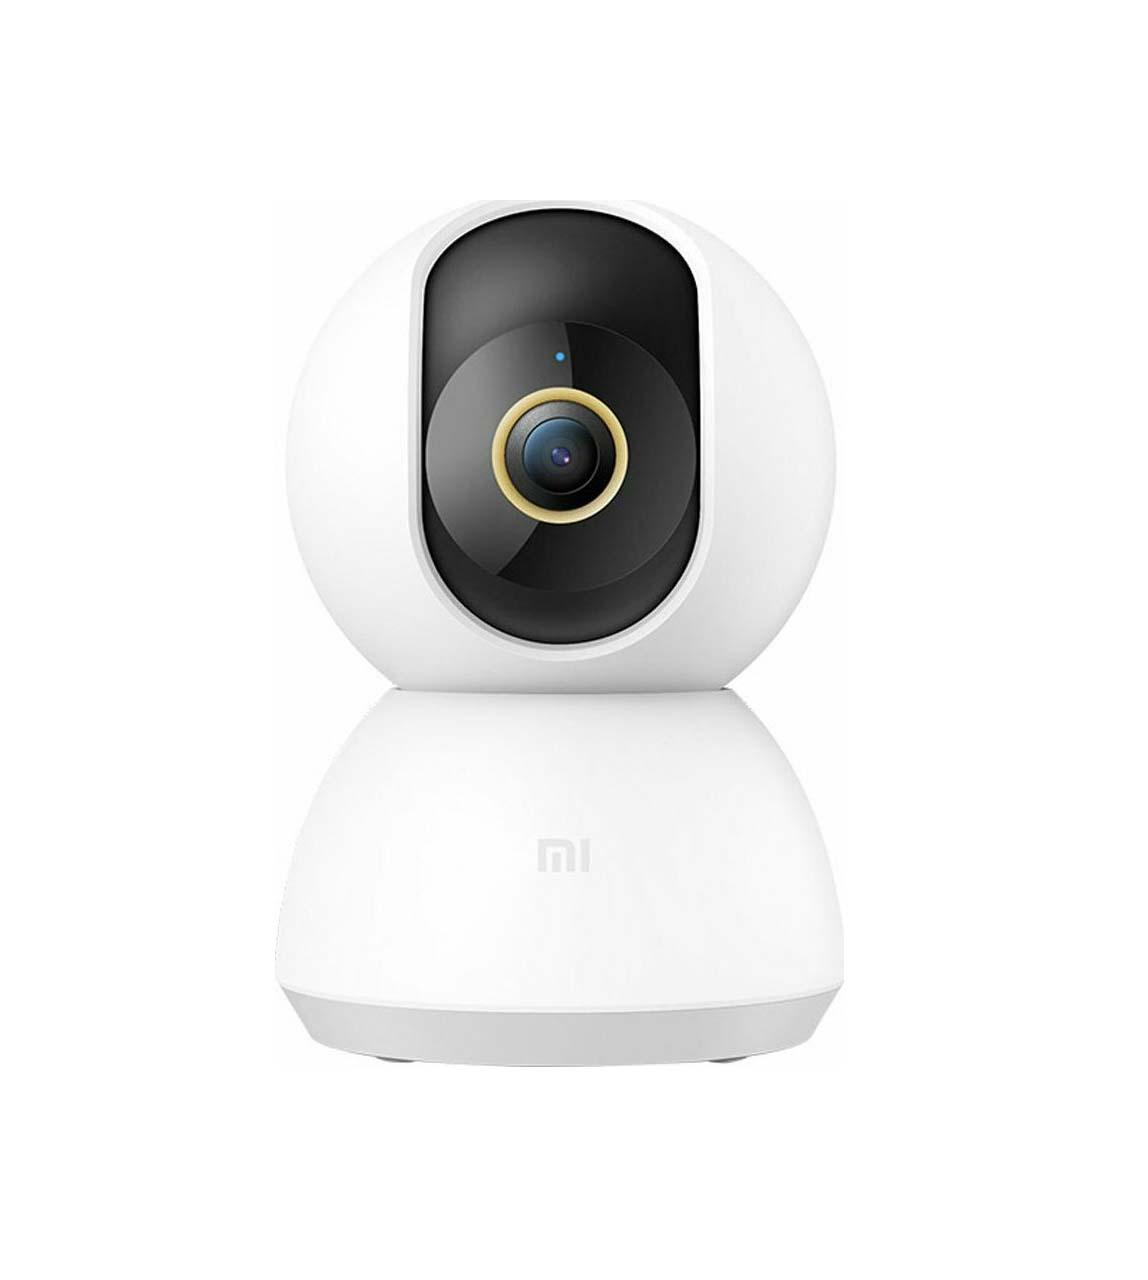 Xiaomi Mi Home Security Camera 360° 2k White BHR4457GL (2 χρόνια εγγύηση)